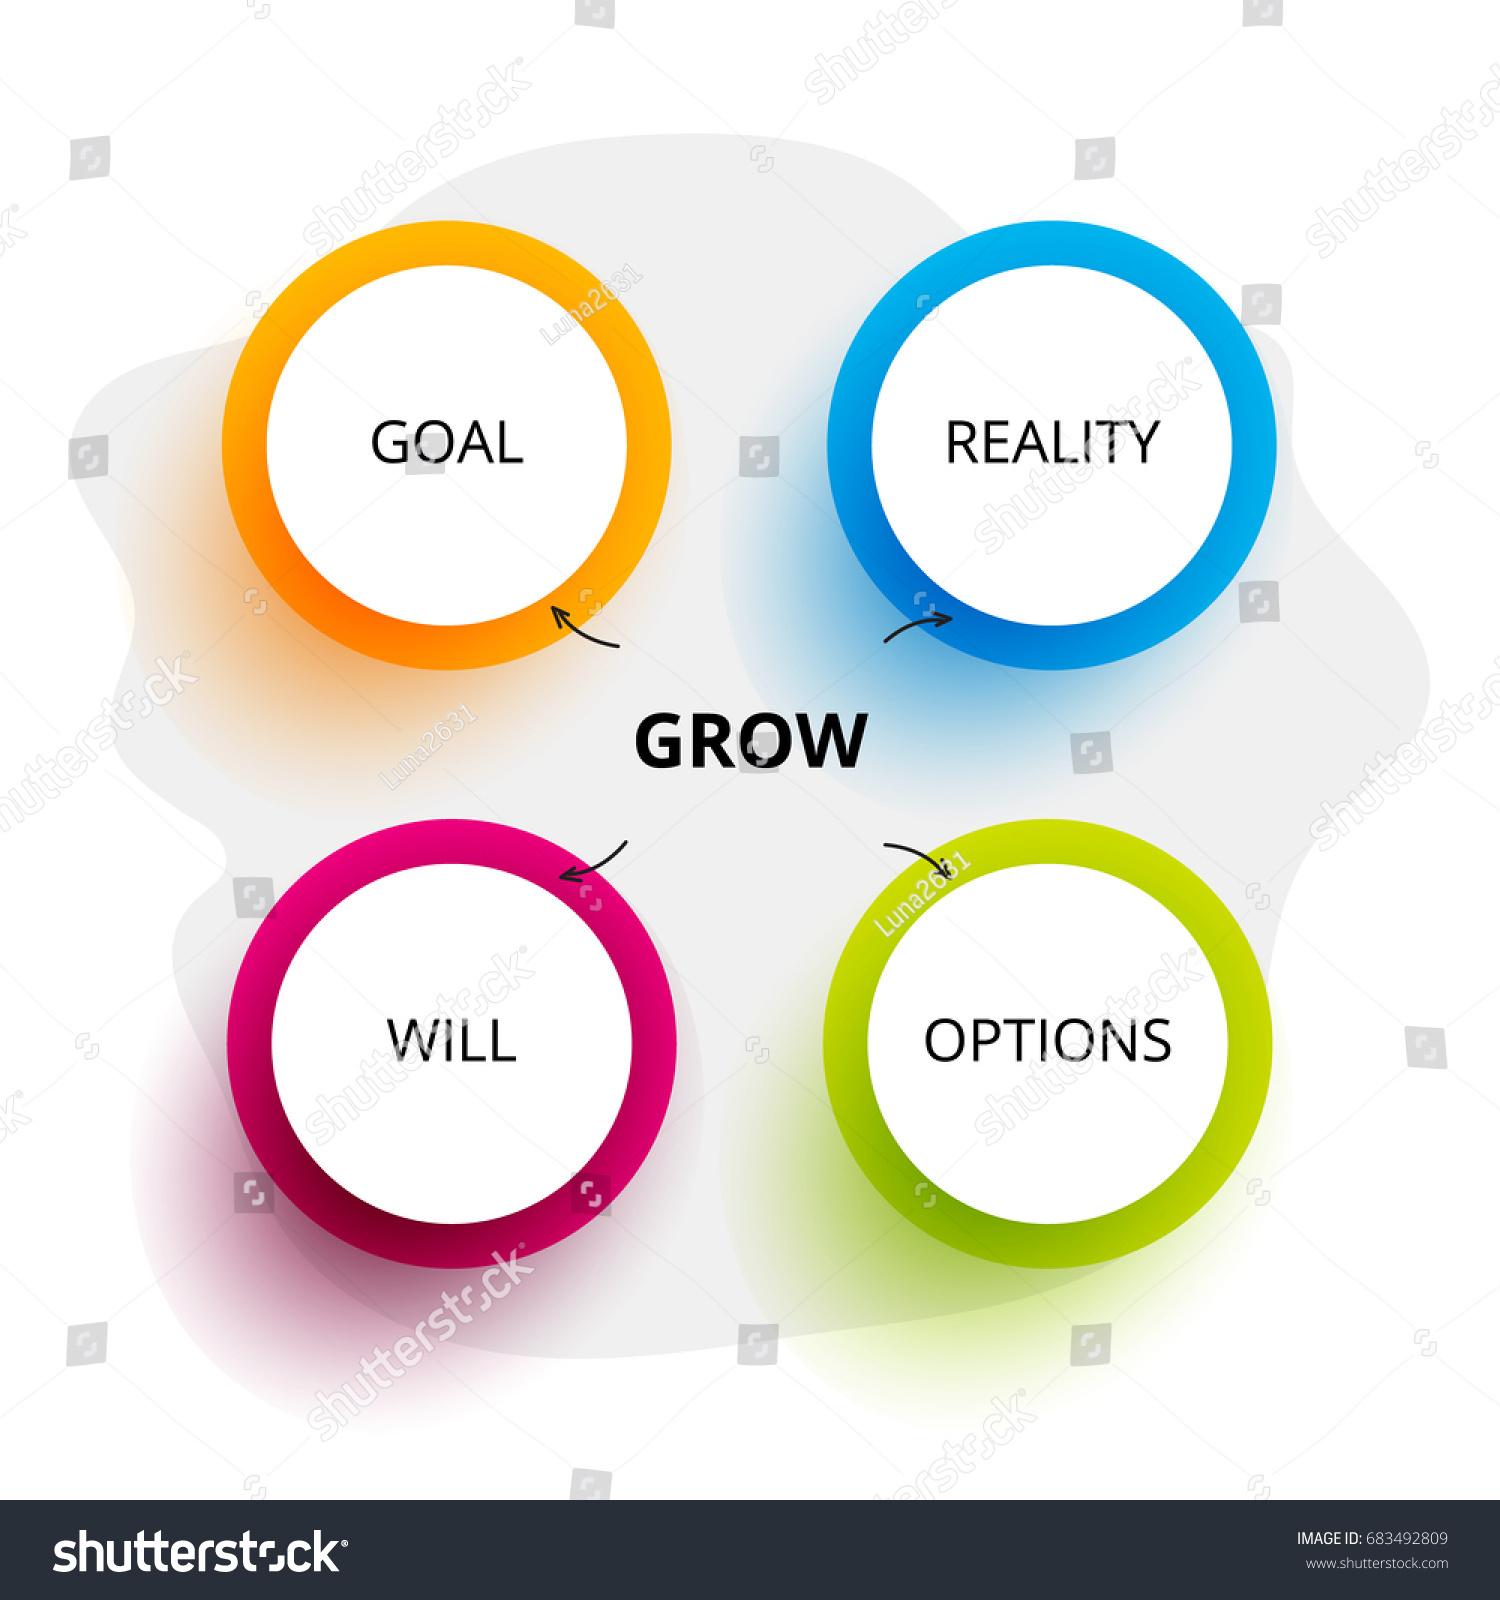 grow coaching template - nice grow model template photos example resume and